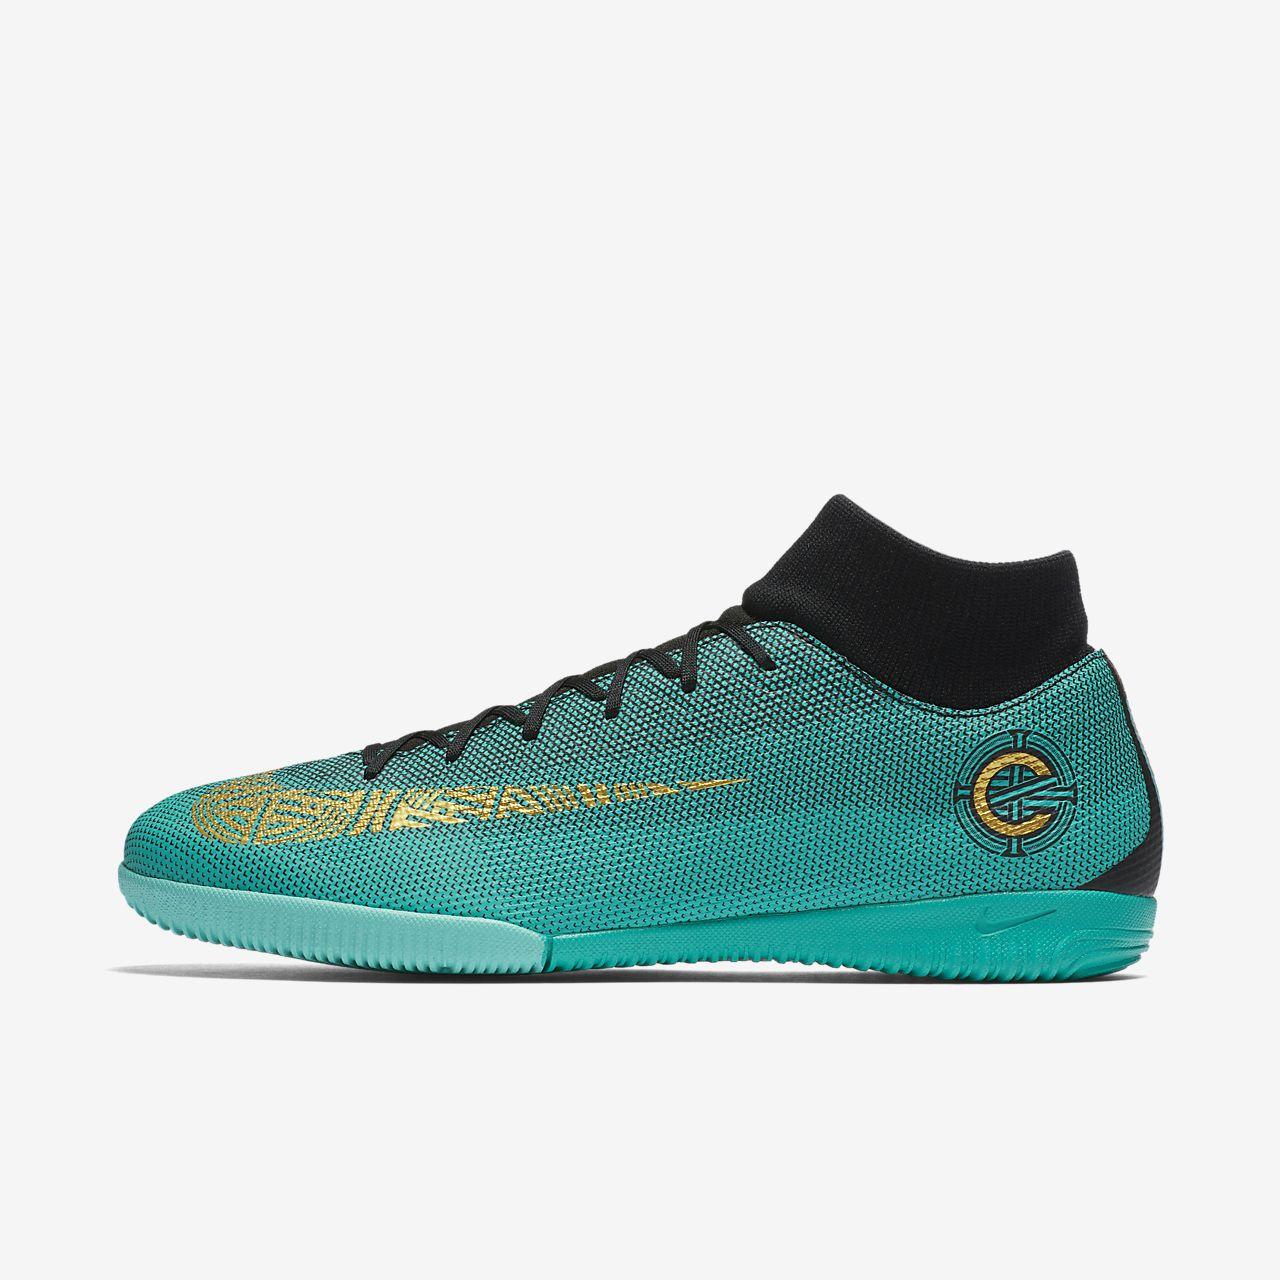 ... Nike MercurialX Superfly VI Academy CR7 IC Indoor/Court Football Shoe